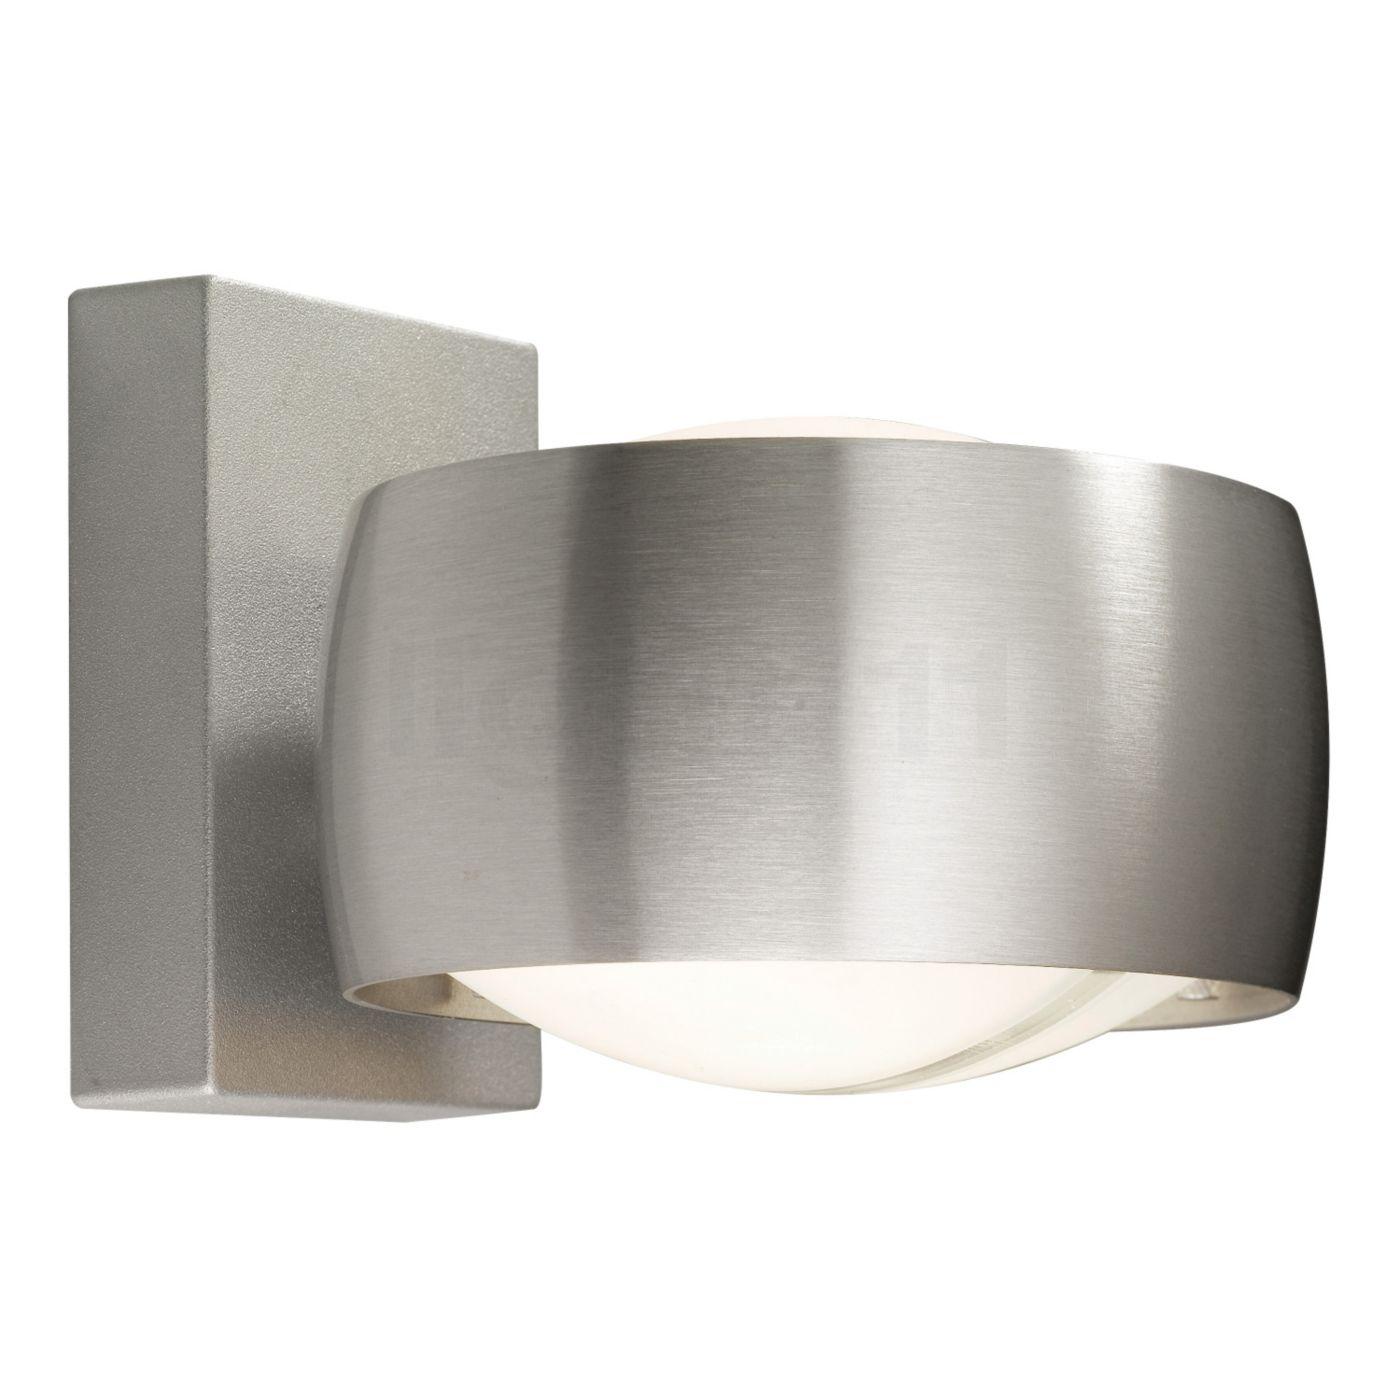 Buy oligo grace wall light at light11 aloadofball Images